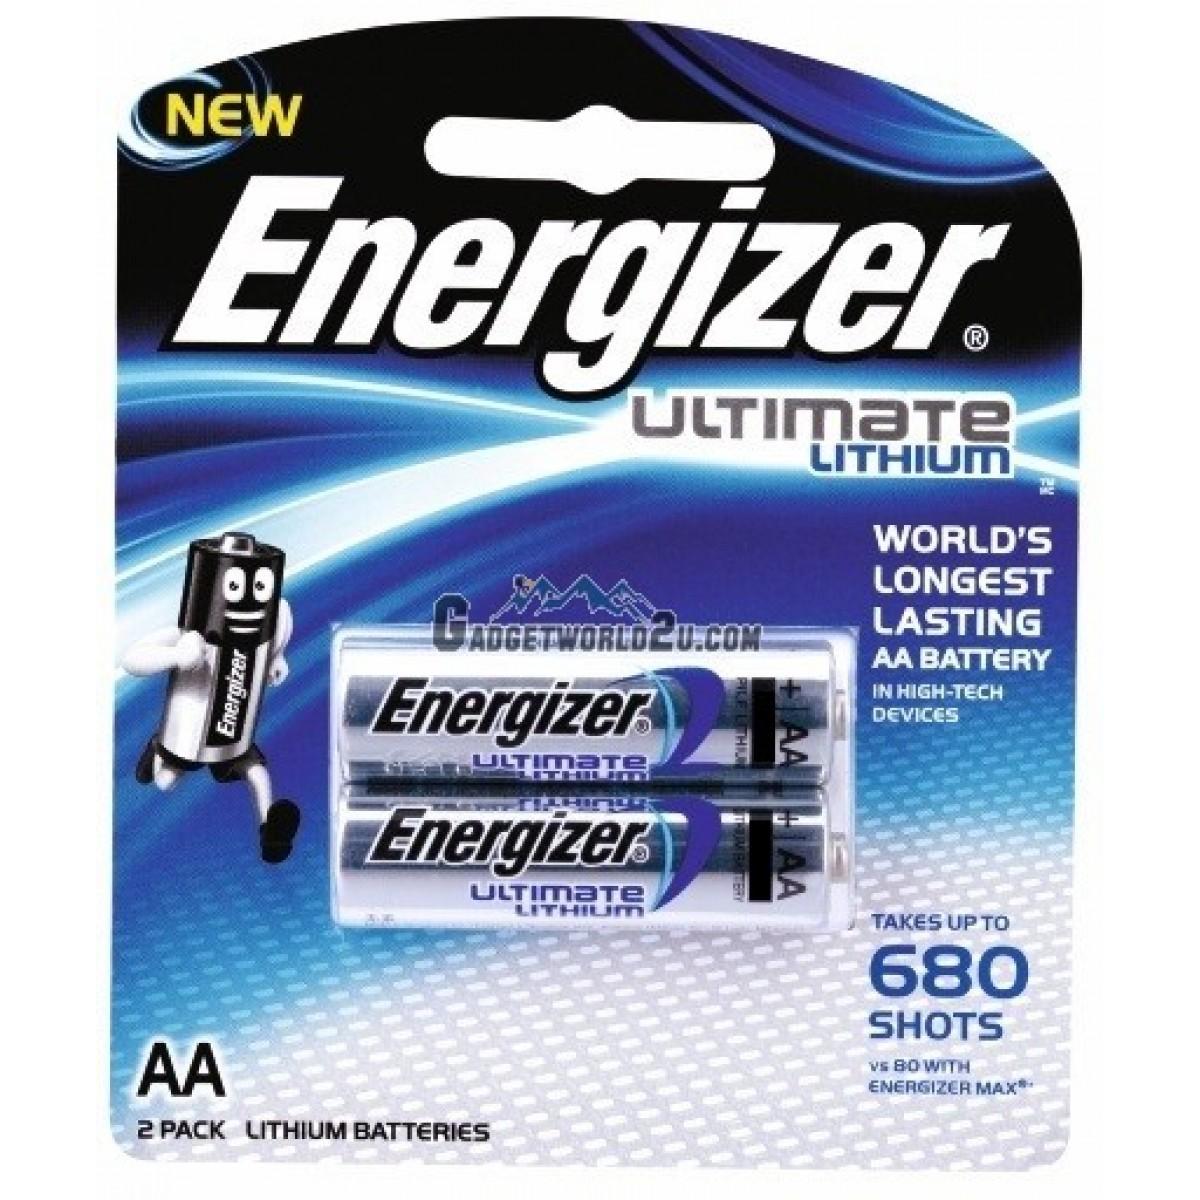 Energizer Ultimate Lithium AA Battery 2pcs